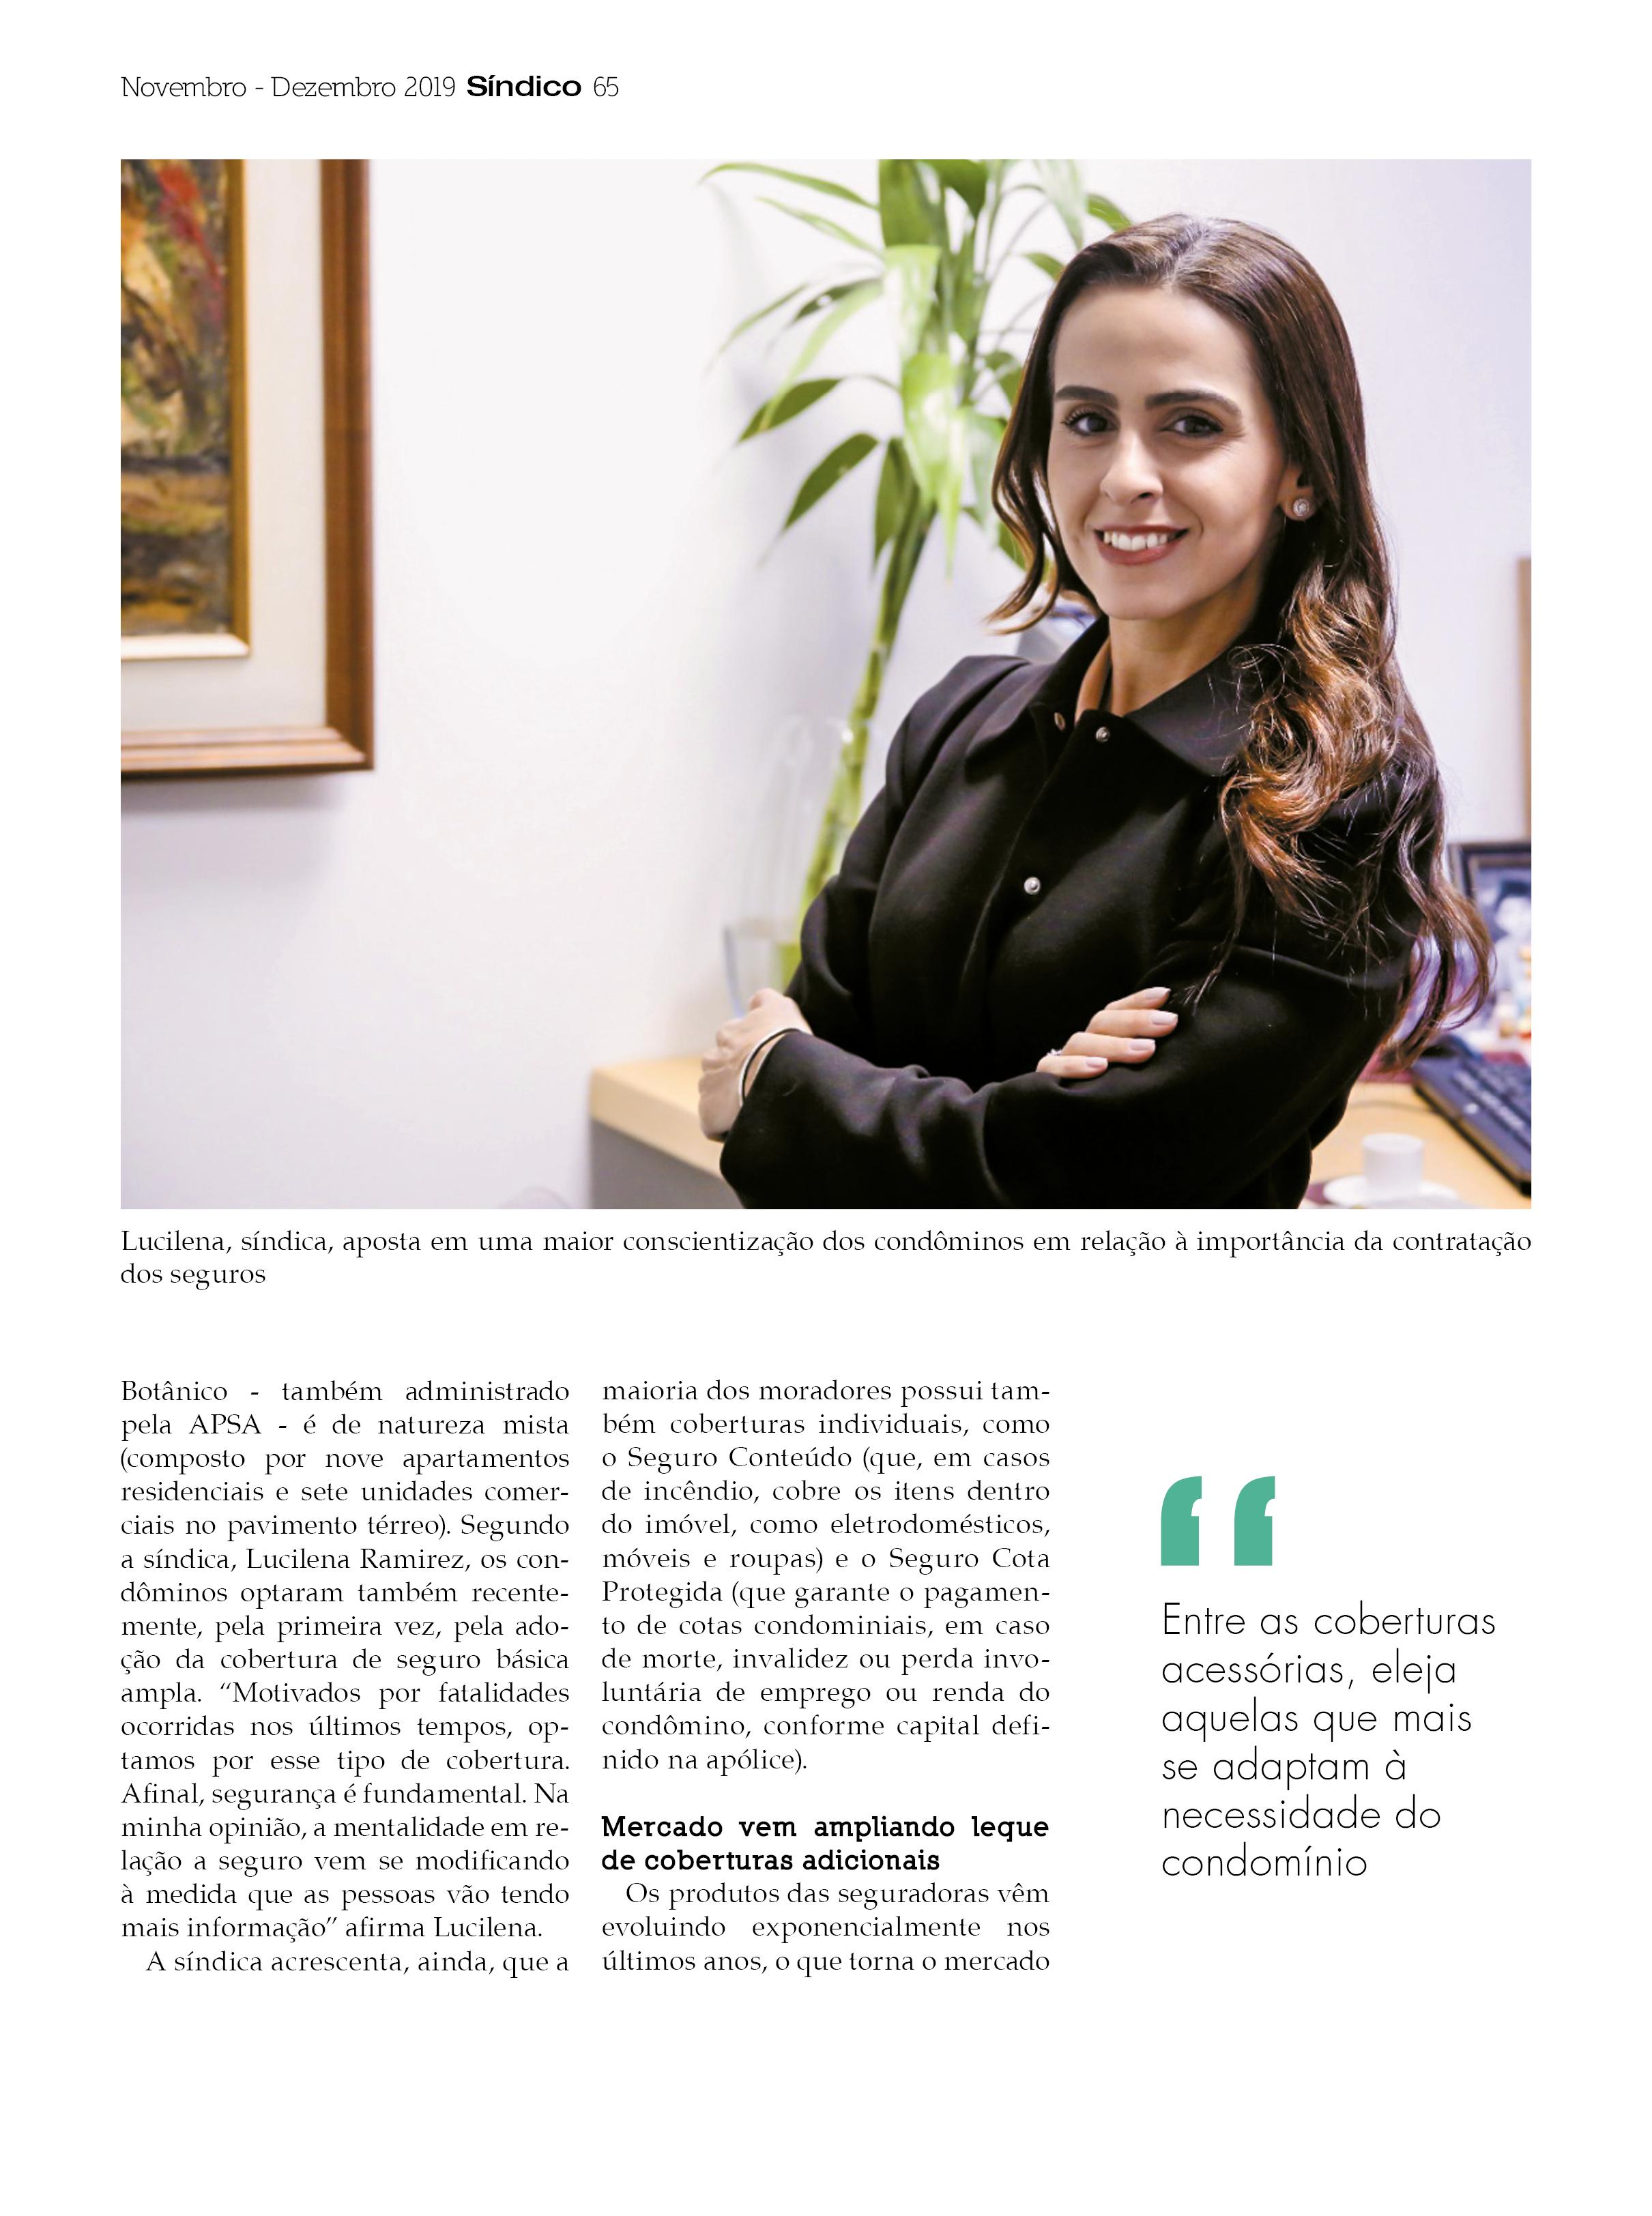 Revista Síndico_ed 247_63